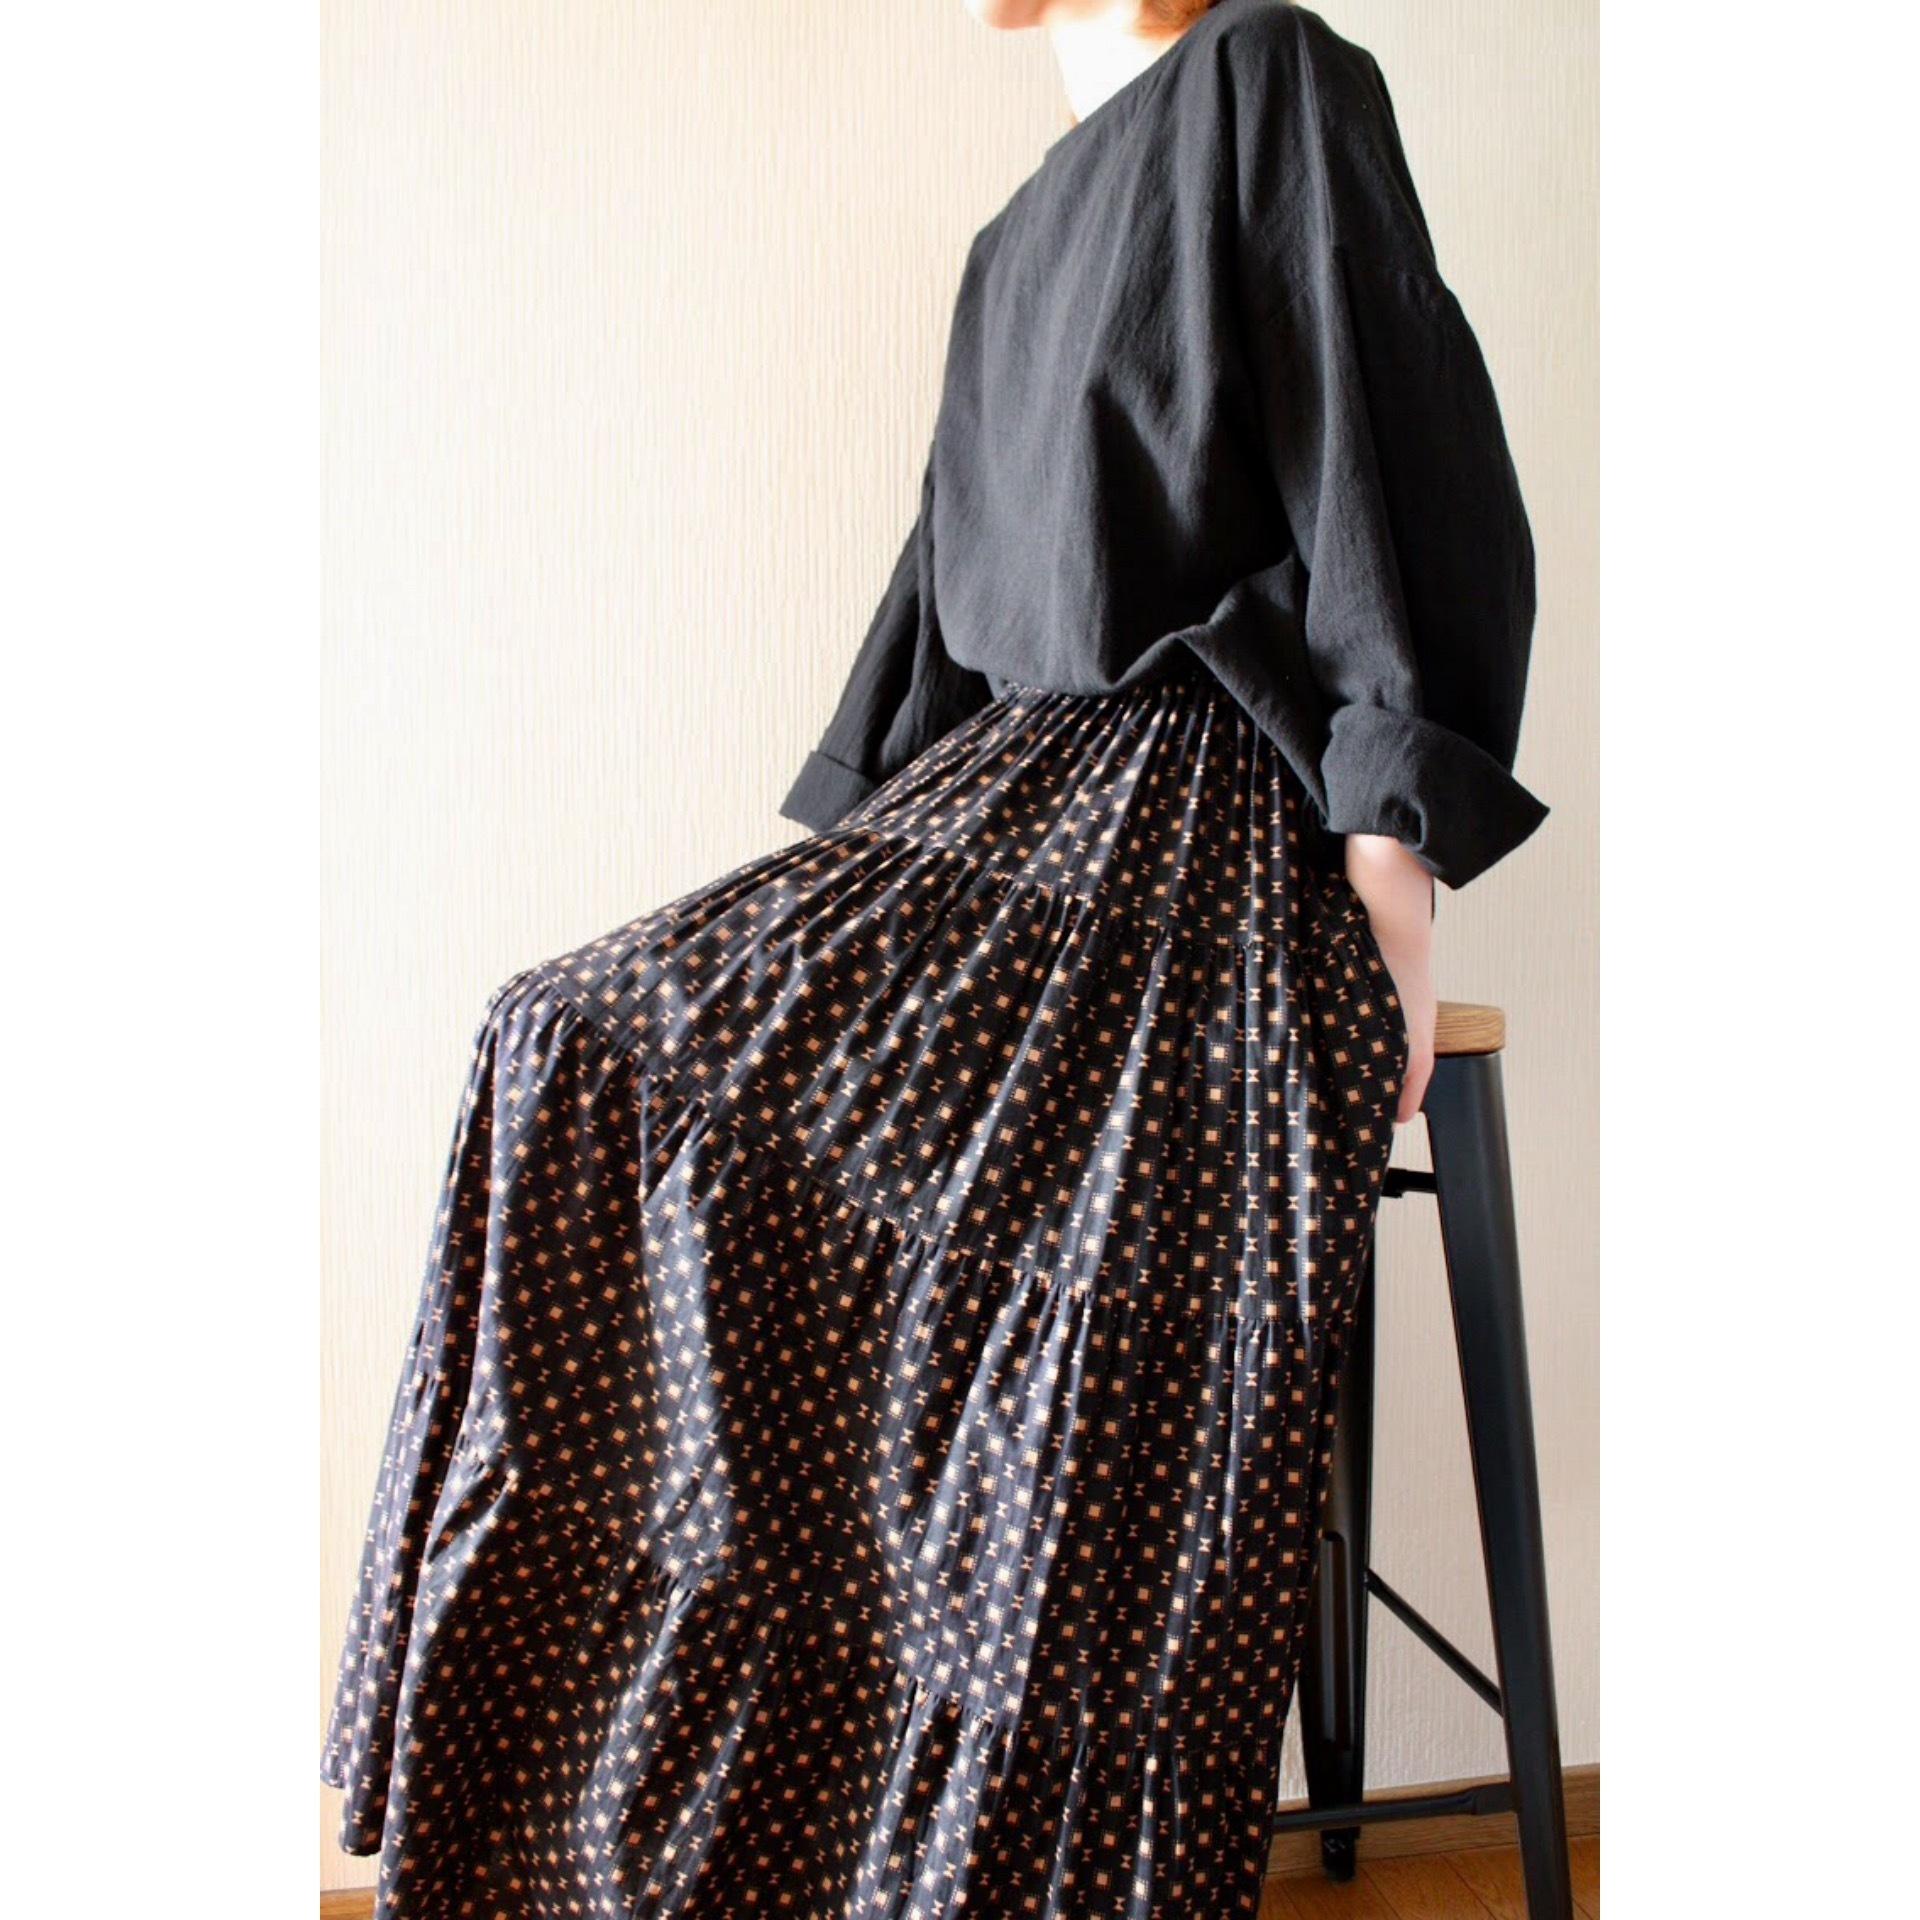 Vintage cotton tiered skirt